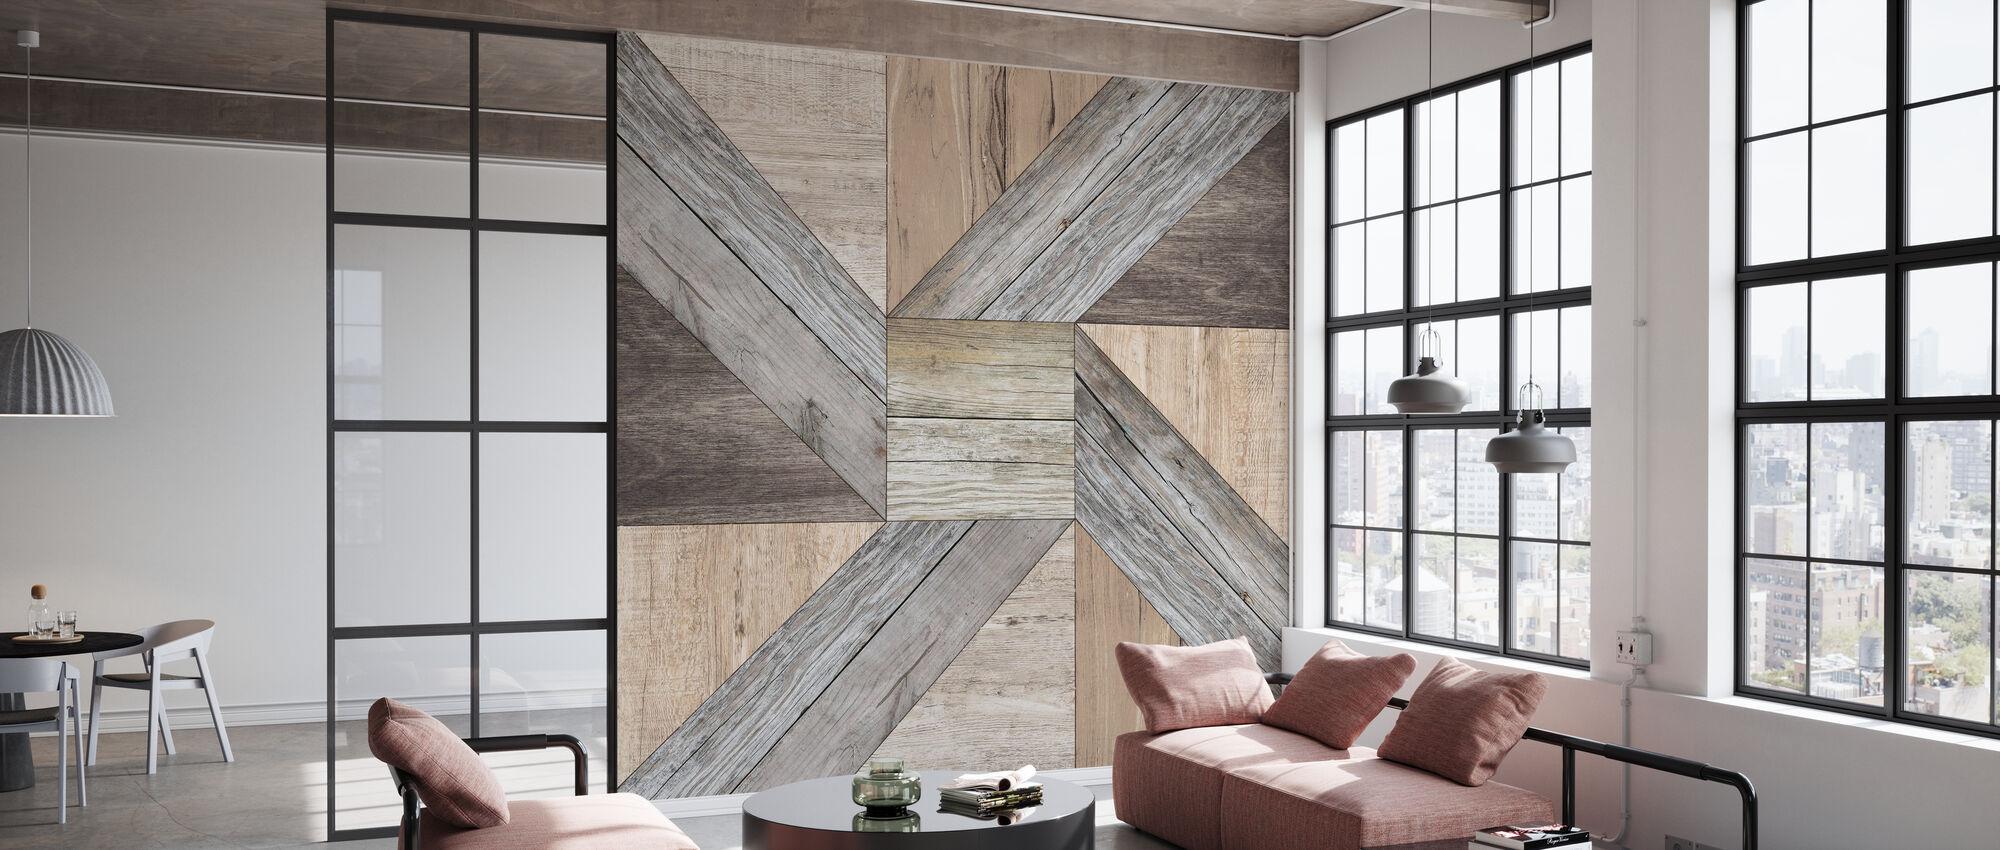 Reclaimed Pinwheel - Wallpaper - Office